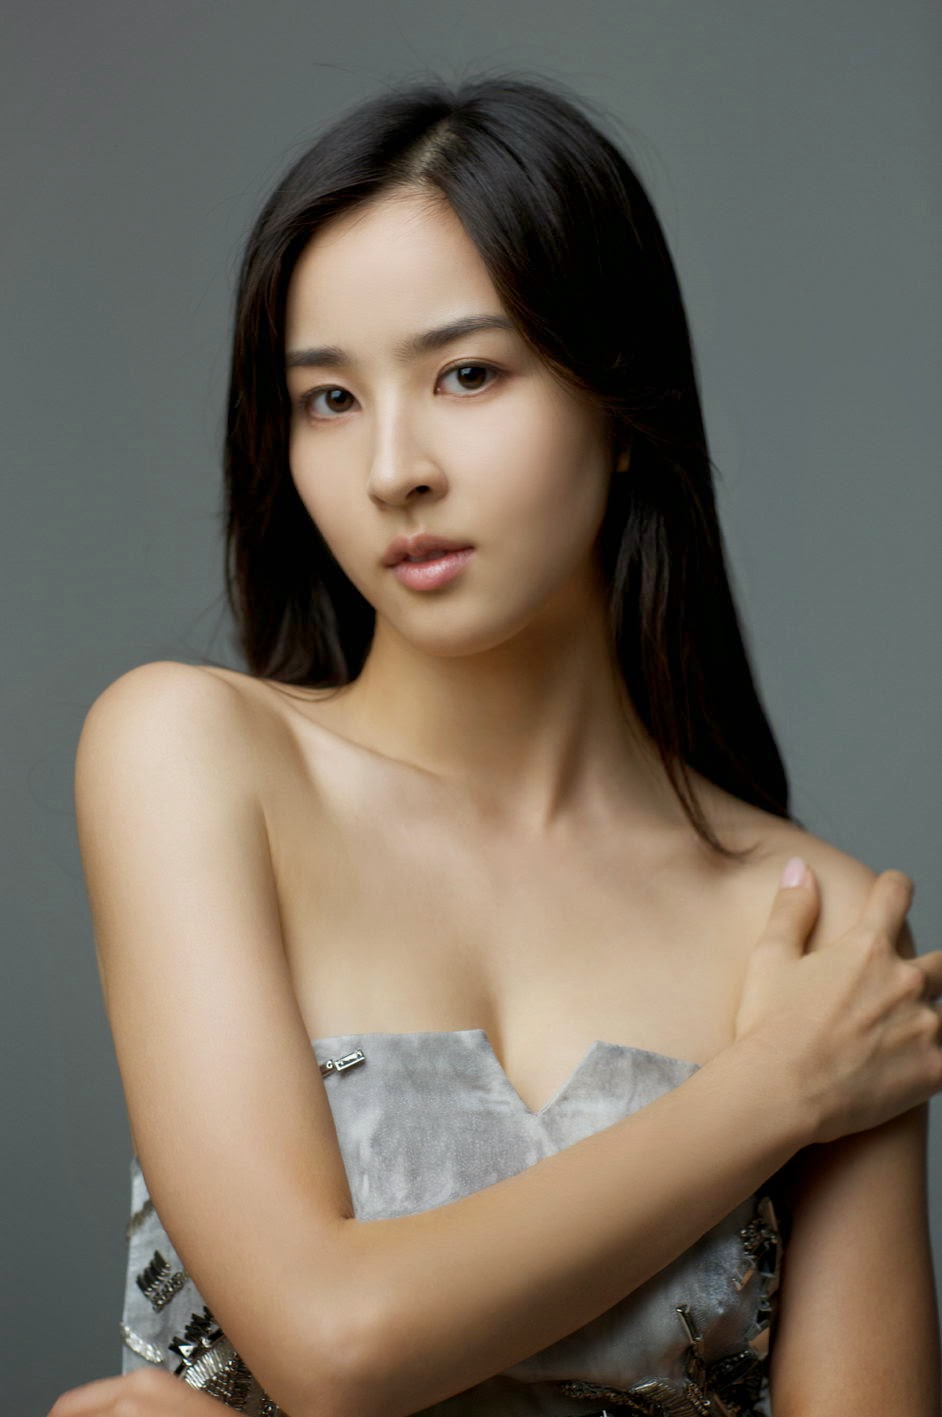 Another hye jin korean girl sex tape